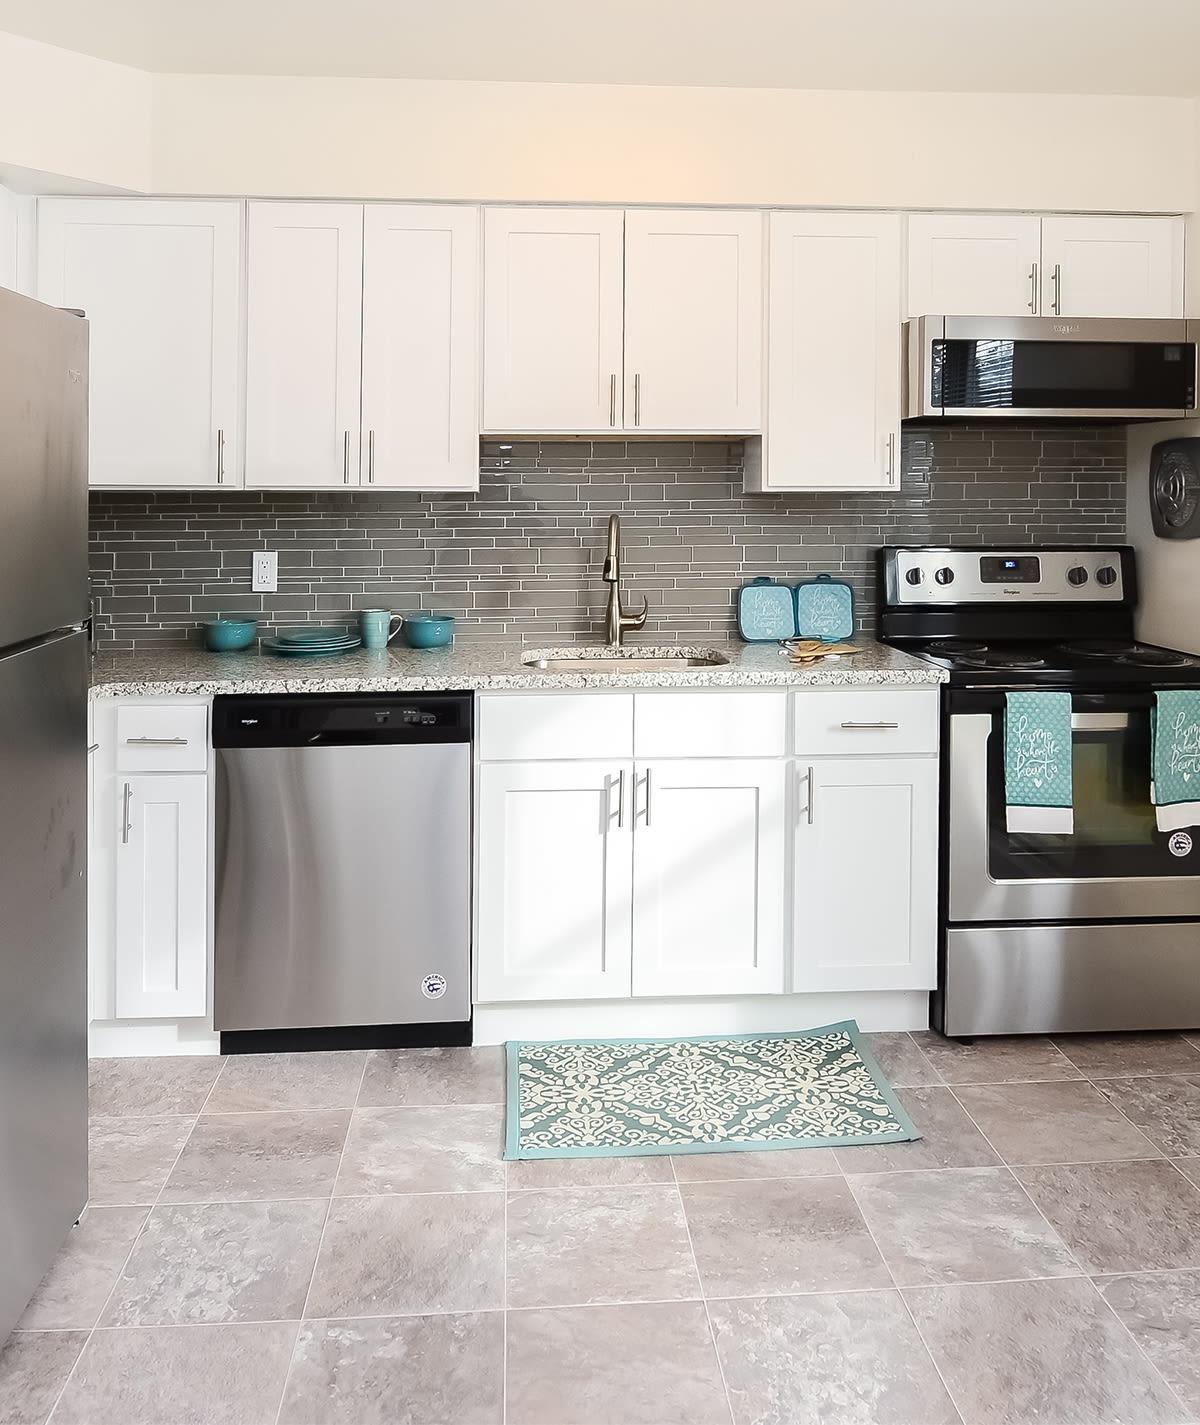 Eatontown, NJ Apartments For Rent